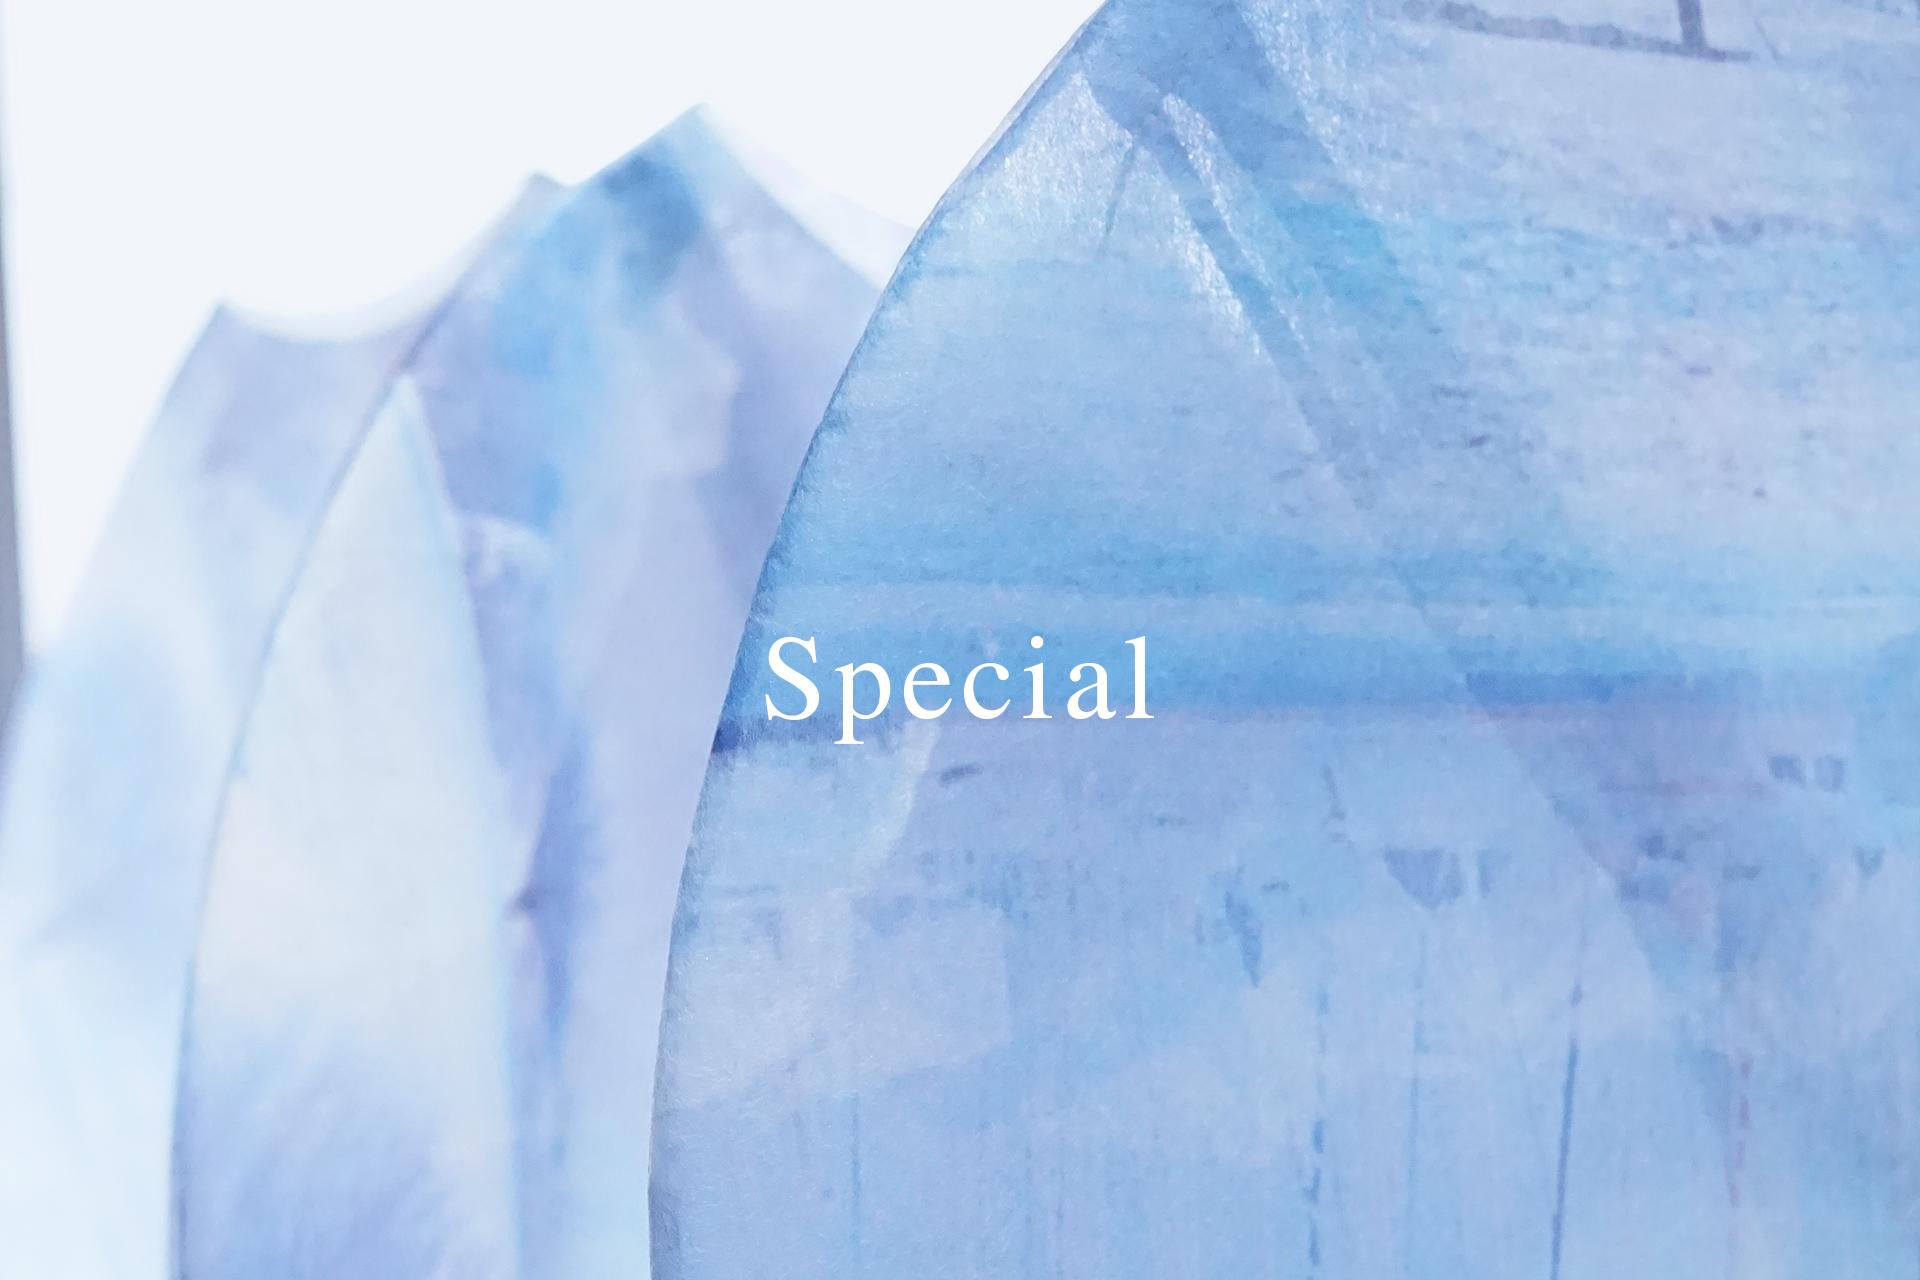 Special_1280